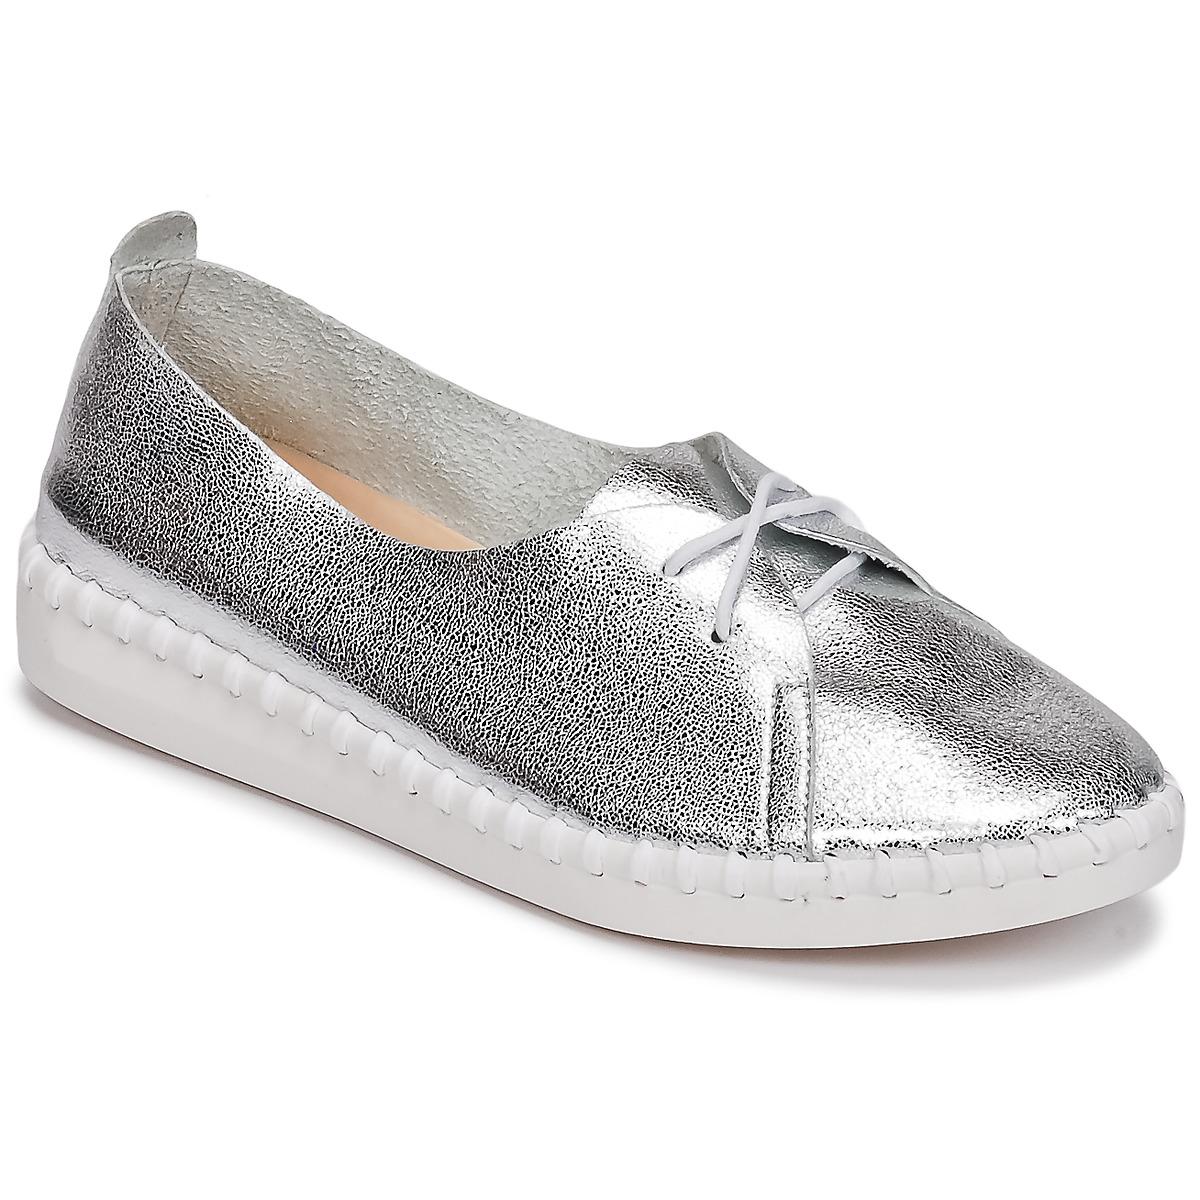 Sko LPB Shoes  DEMY